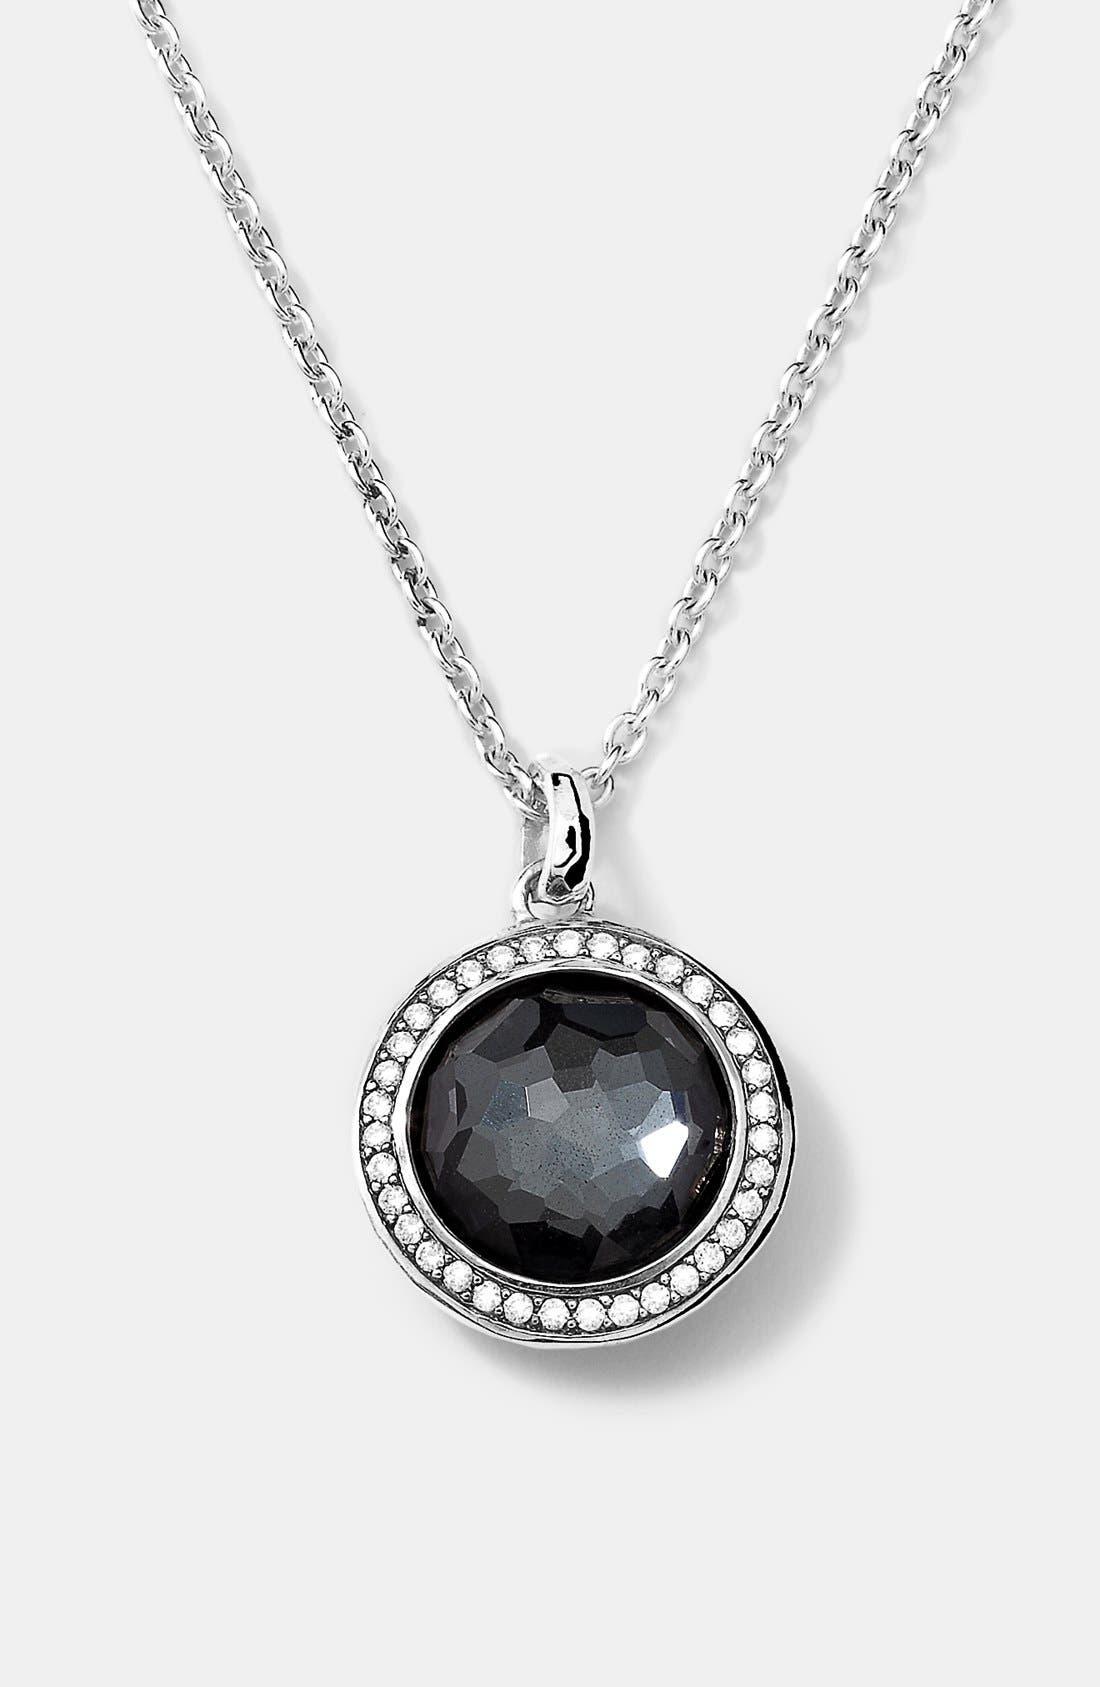 Main Image - Ippolita 'Stella' Small Pendant Necklace